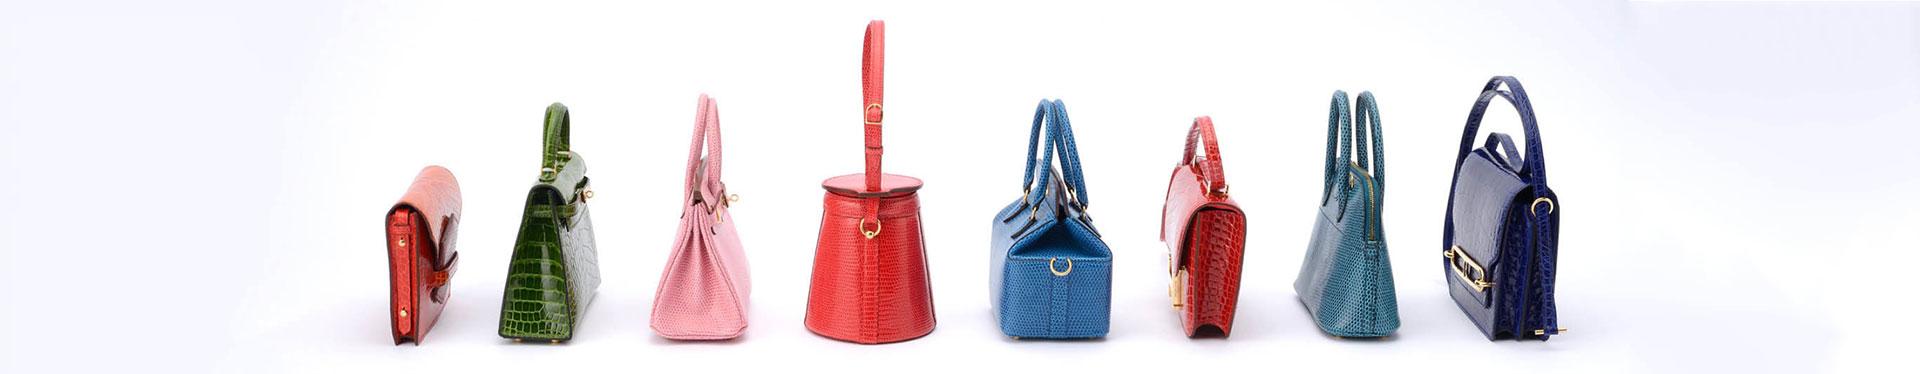 62b4663b002 handbags-and-accessories-banner-FINAL 22 1 20170104110618.jpg